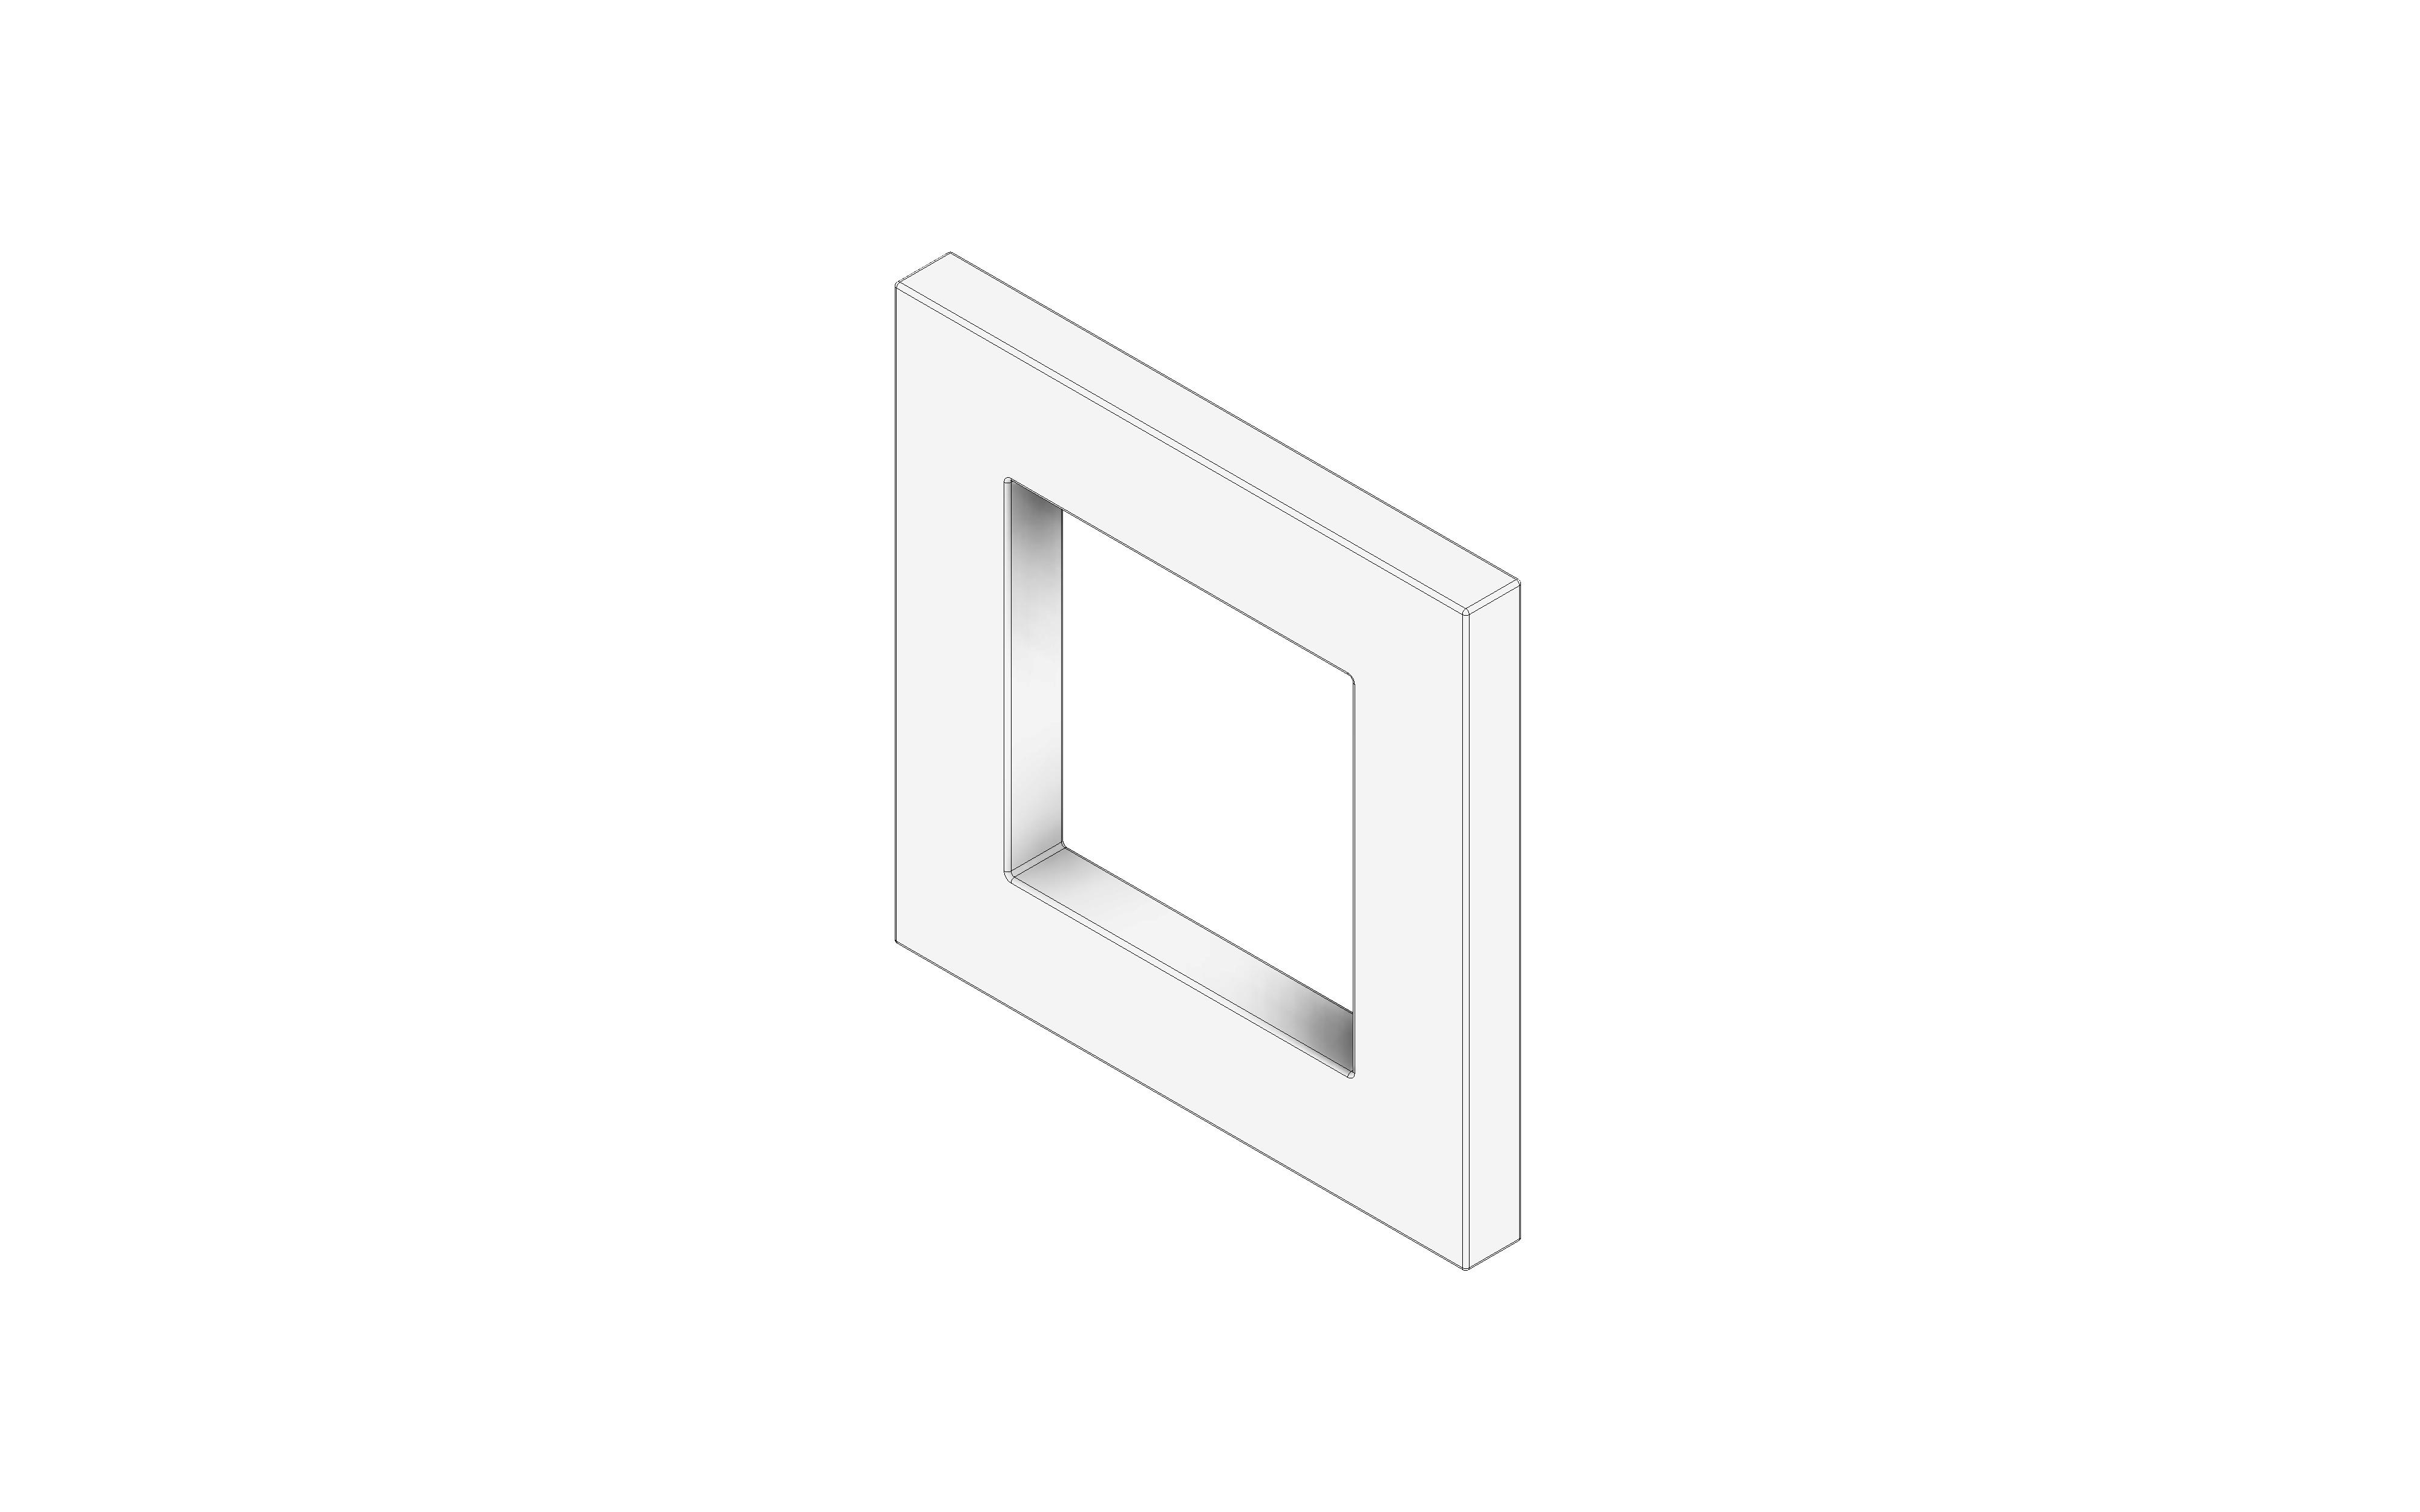 Quadratgriff Alu eloxiert